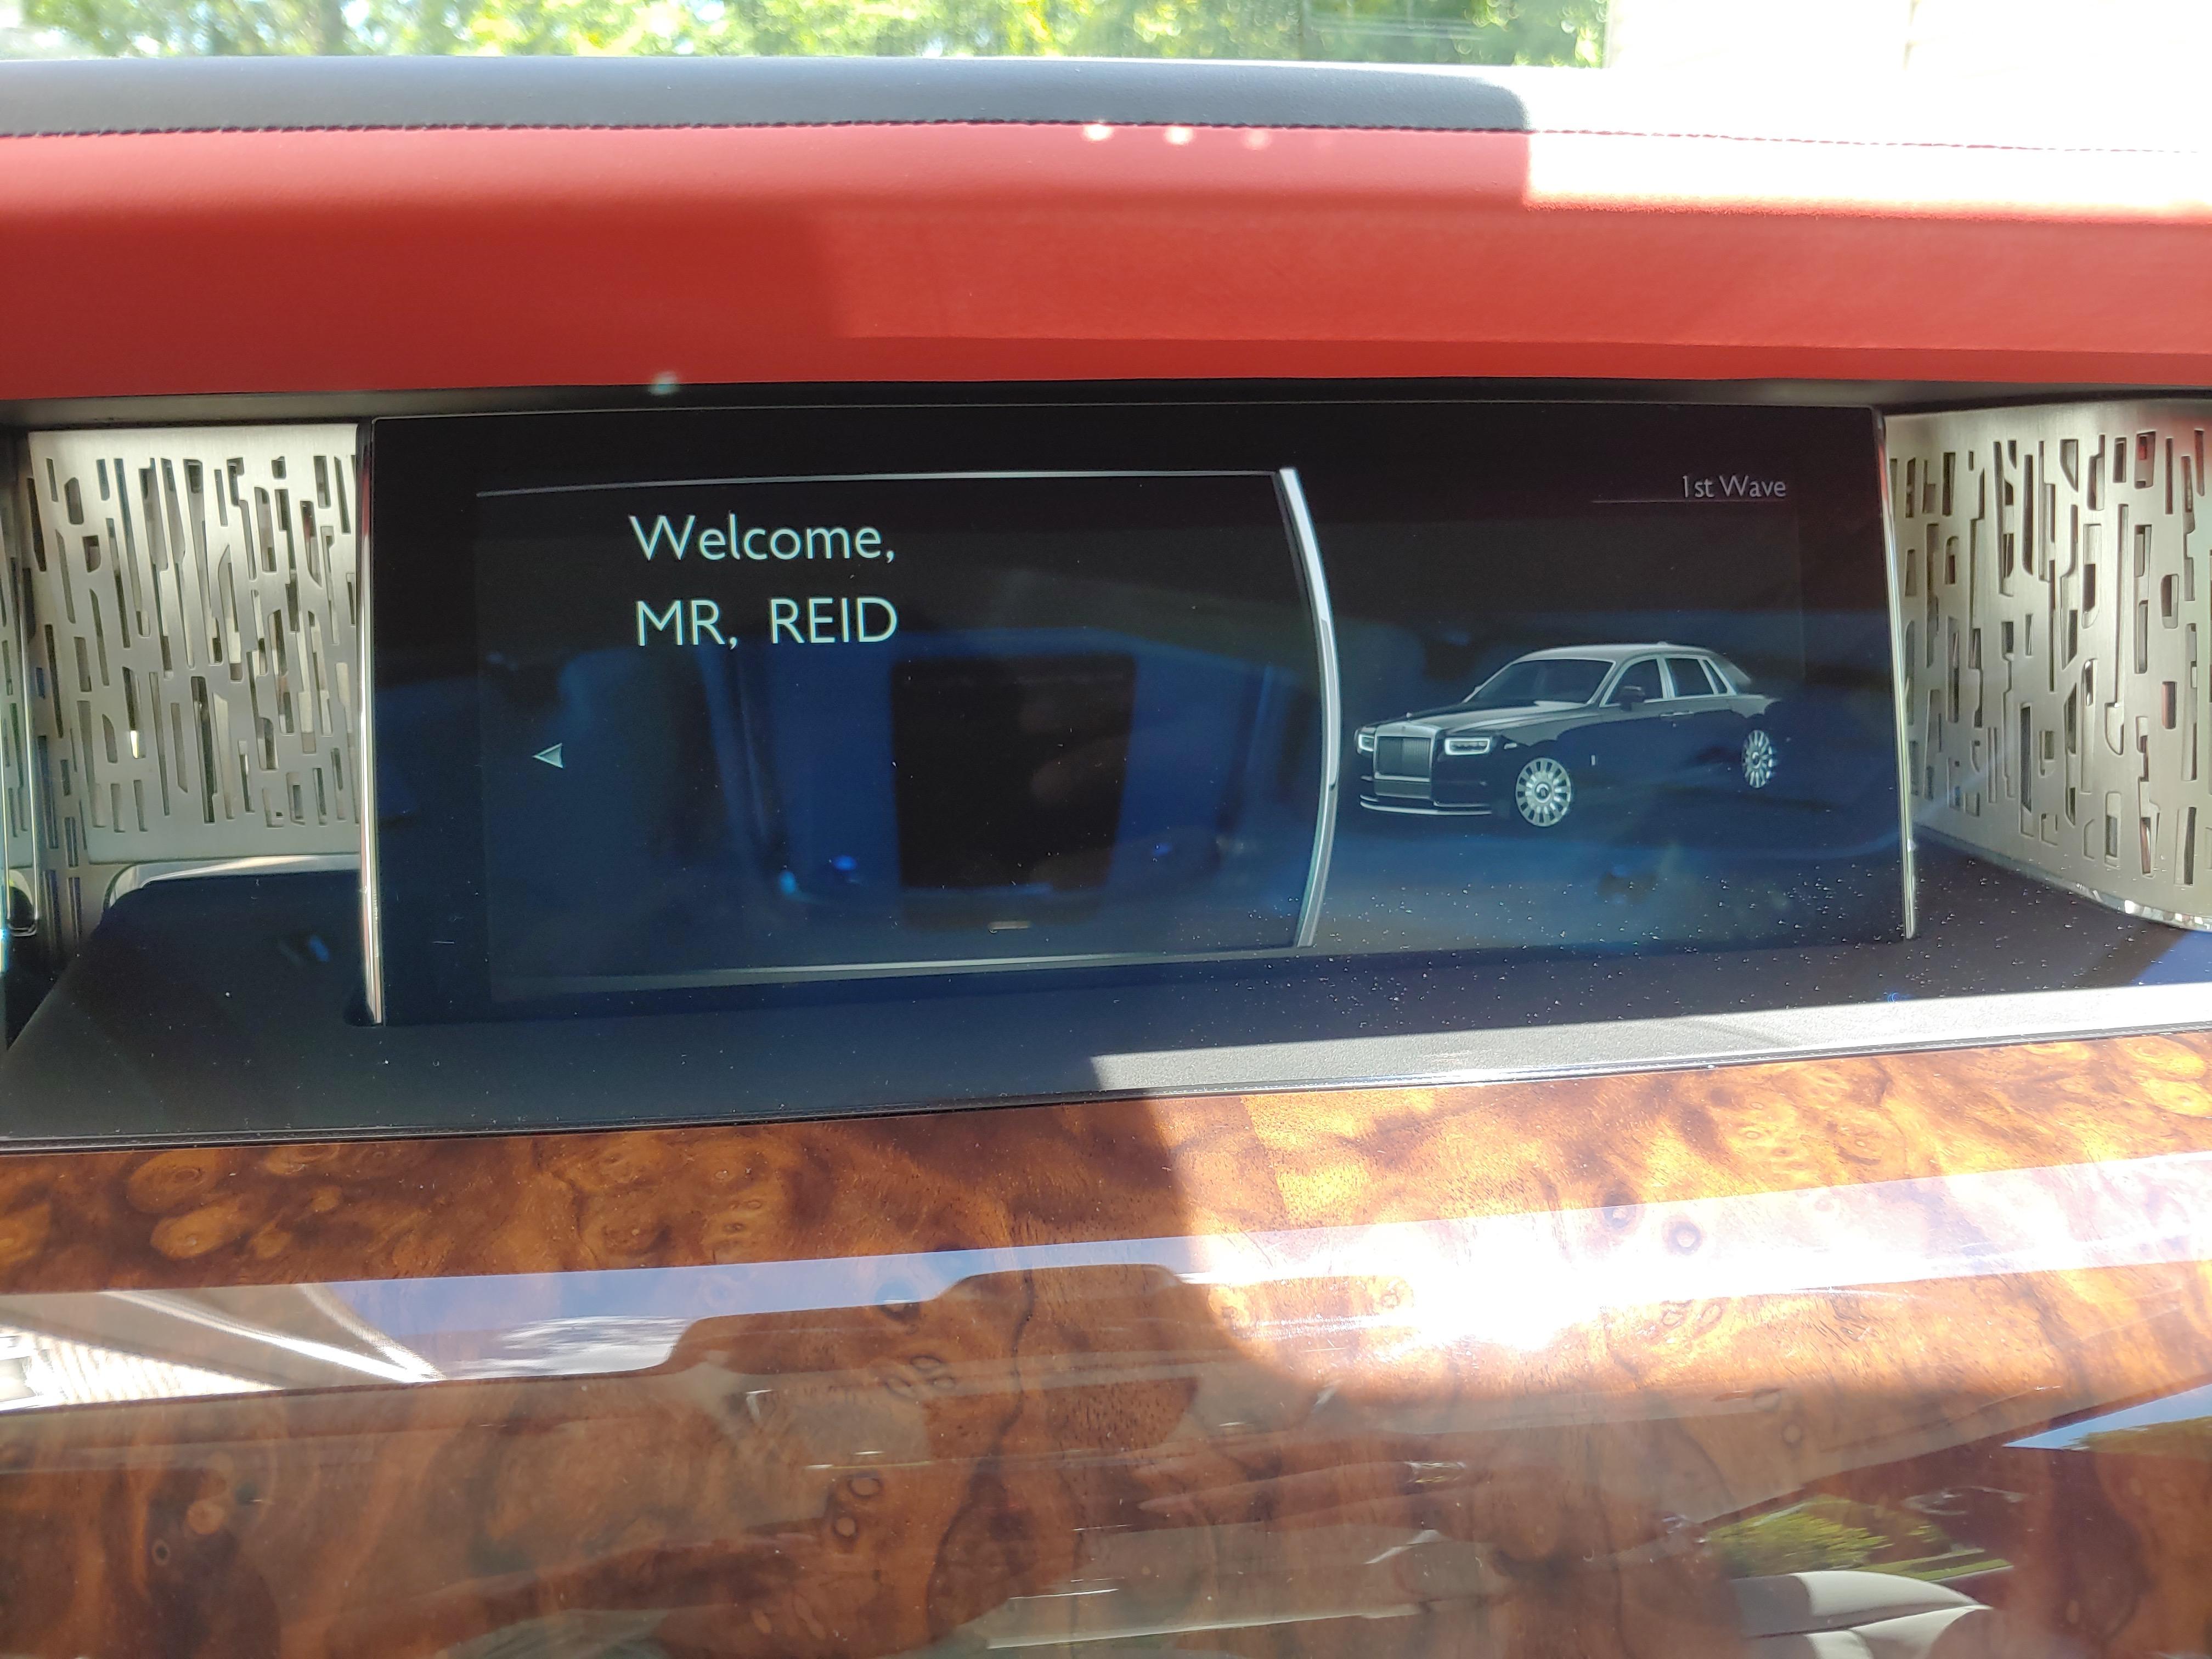 Rolls-Royce Phantom VIII, Driven: The finest motorcar in the world, ClassicCars.com Journal